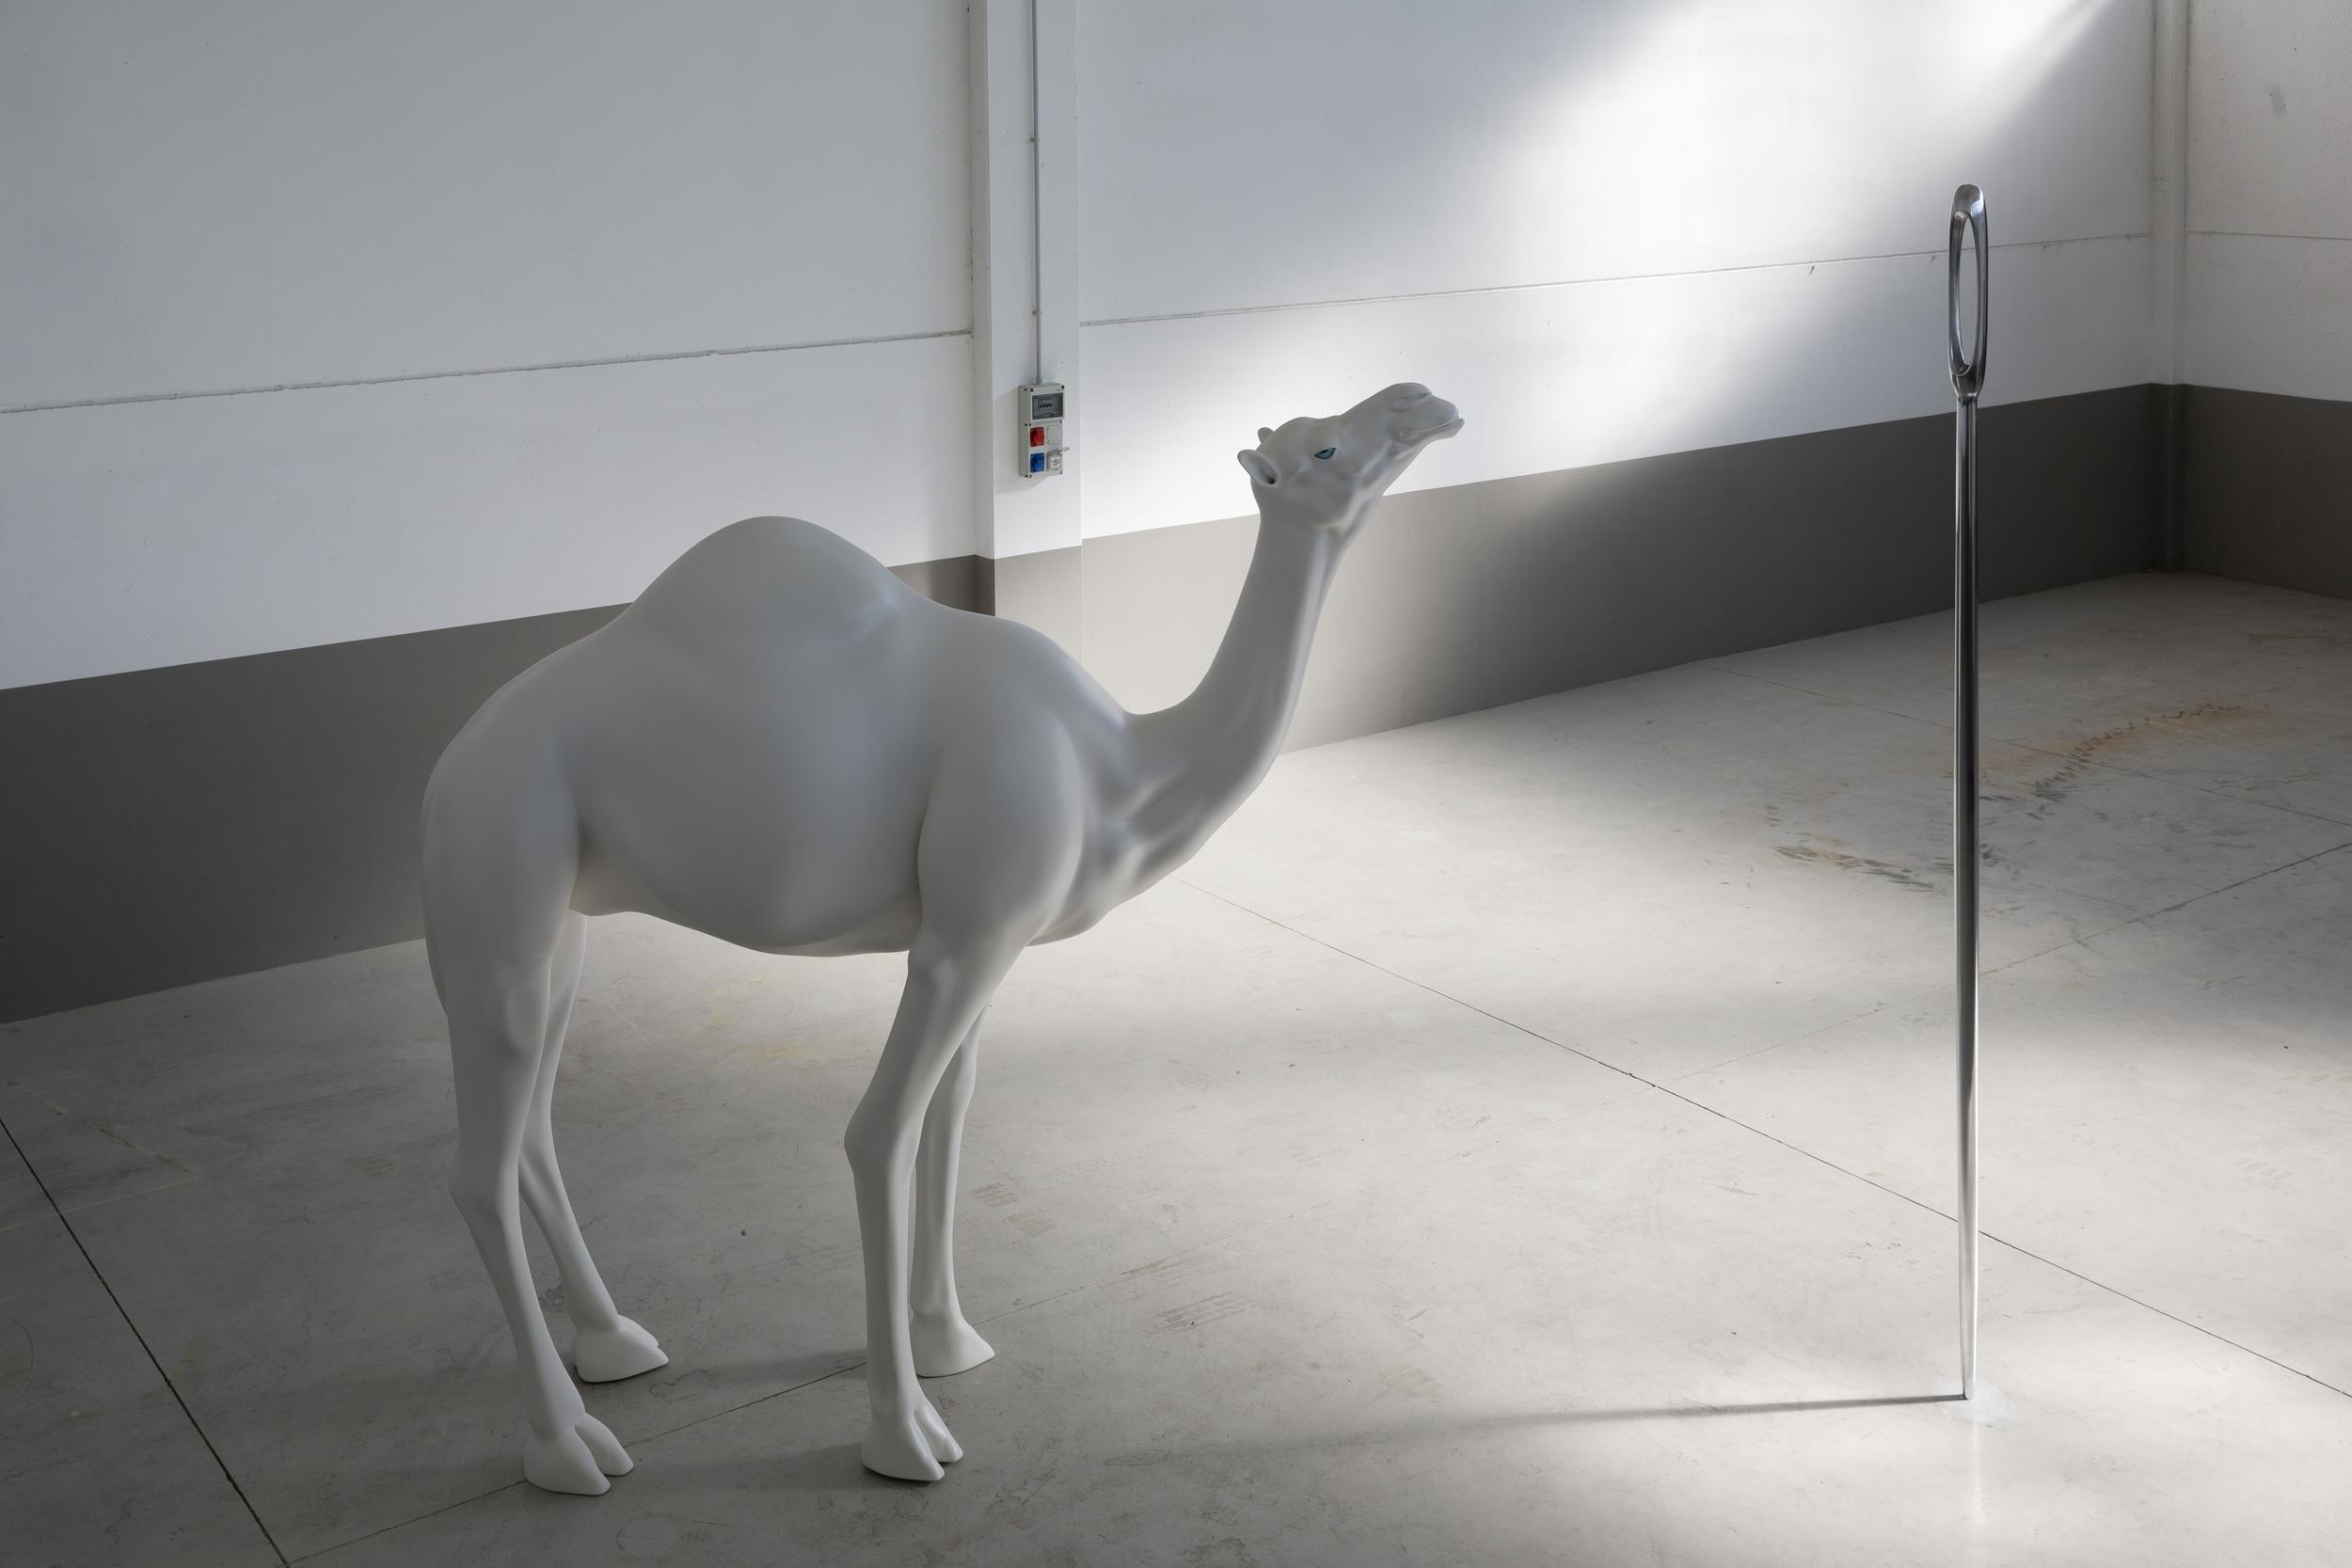 John Baldessari sculpture - Camel